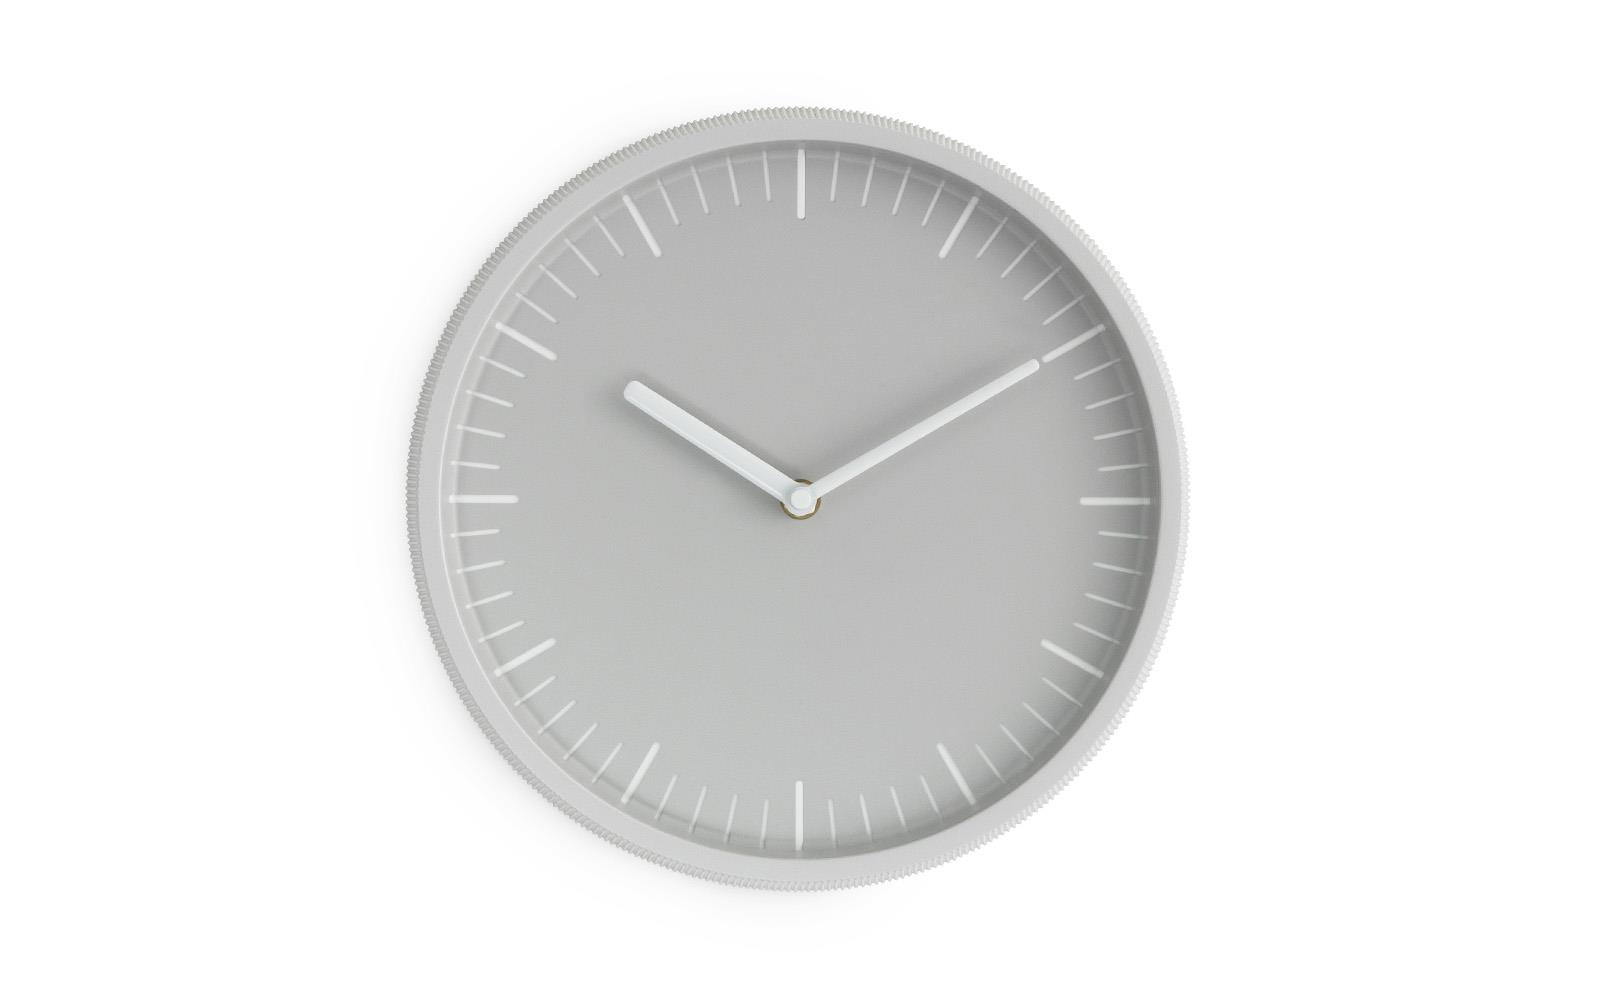 Light Grey Day Wall Clock Scandinavian Deday Is A Simple Wall